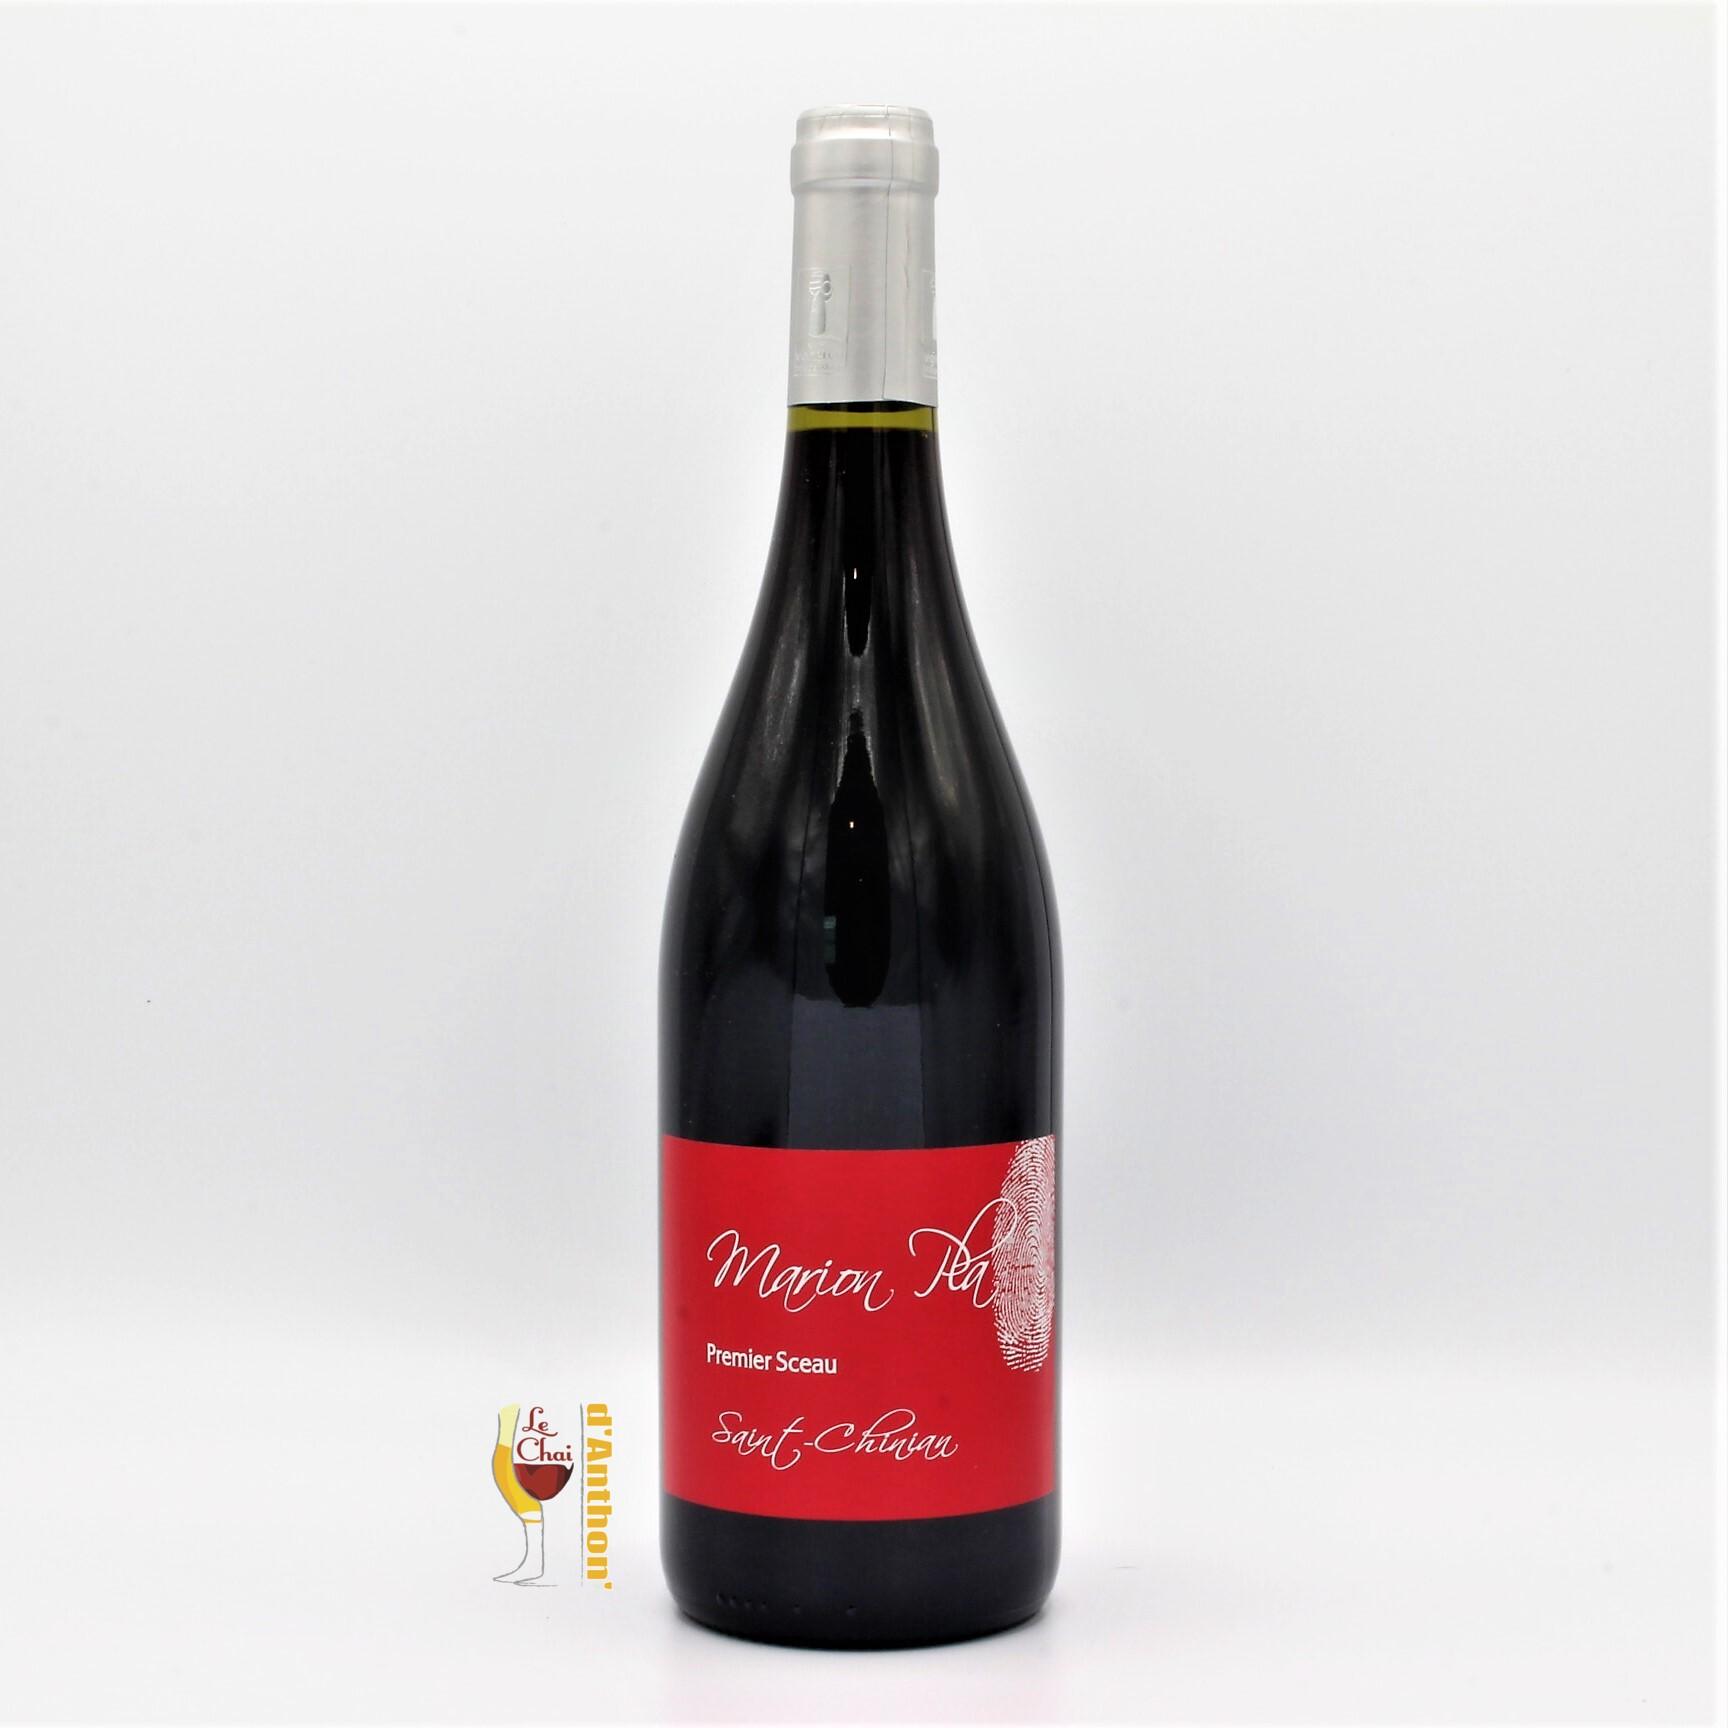 Vin Bouteille Rouge Languedoc Saint Chinian Tradition Marion Pla 75cl